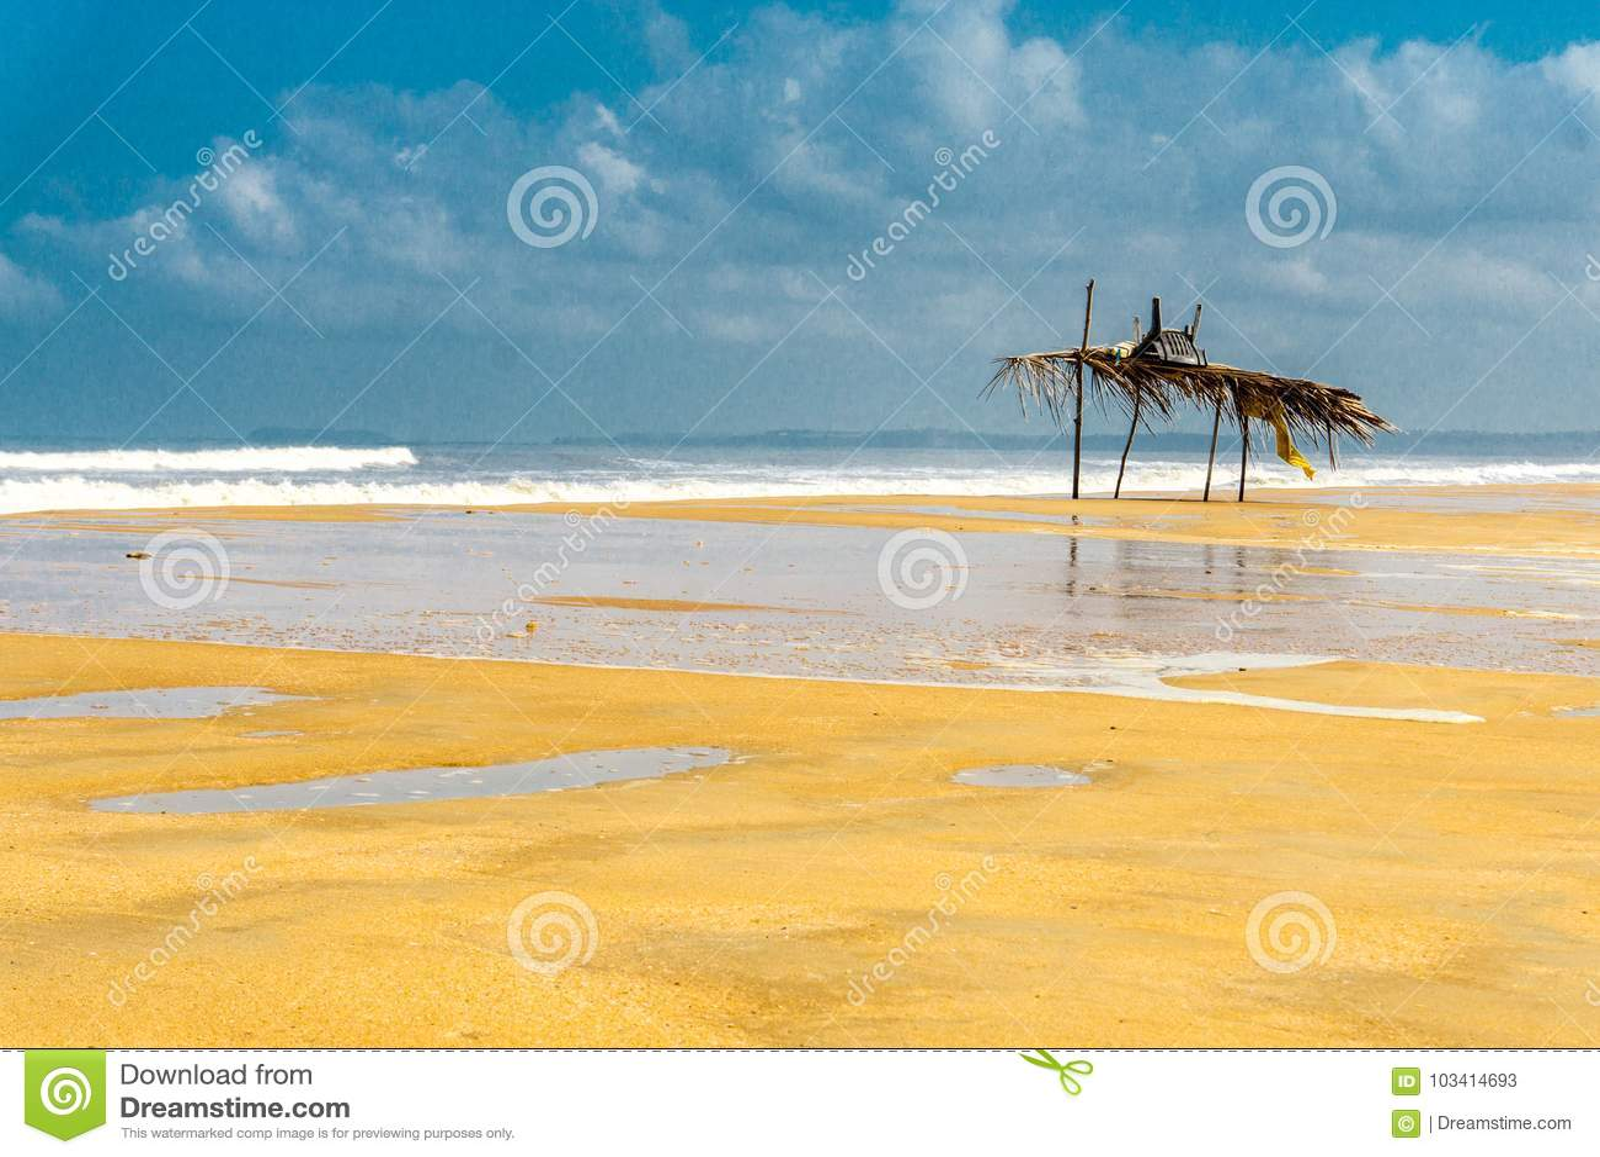 Blauwe bewolkte hemel en brede stranden in Goa, India